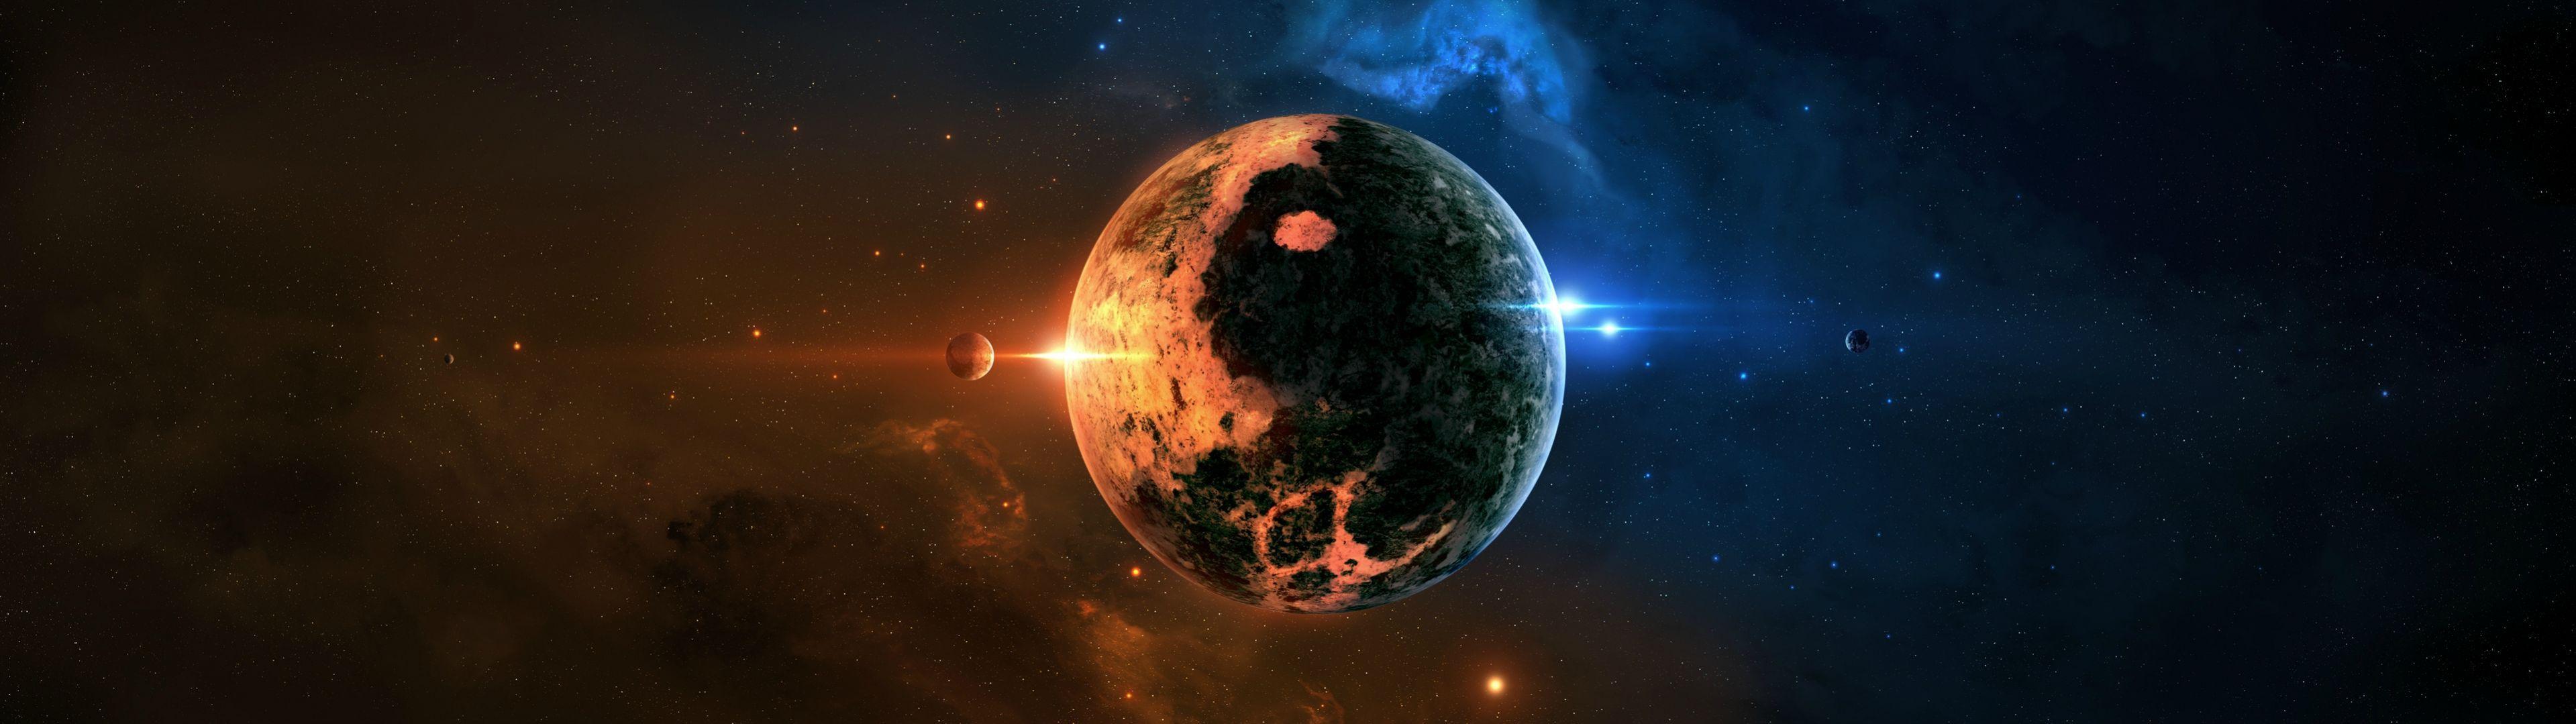 Planet Pic Widescreen Retina Imac Halwell Stevenson 2017 03